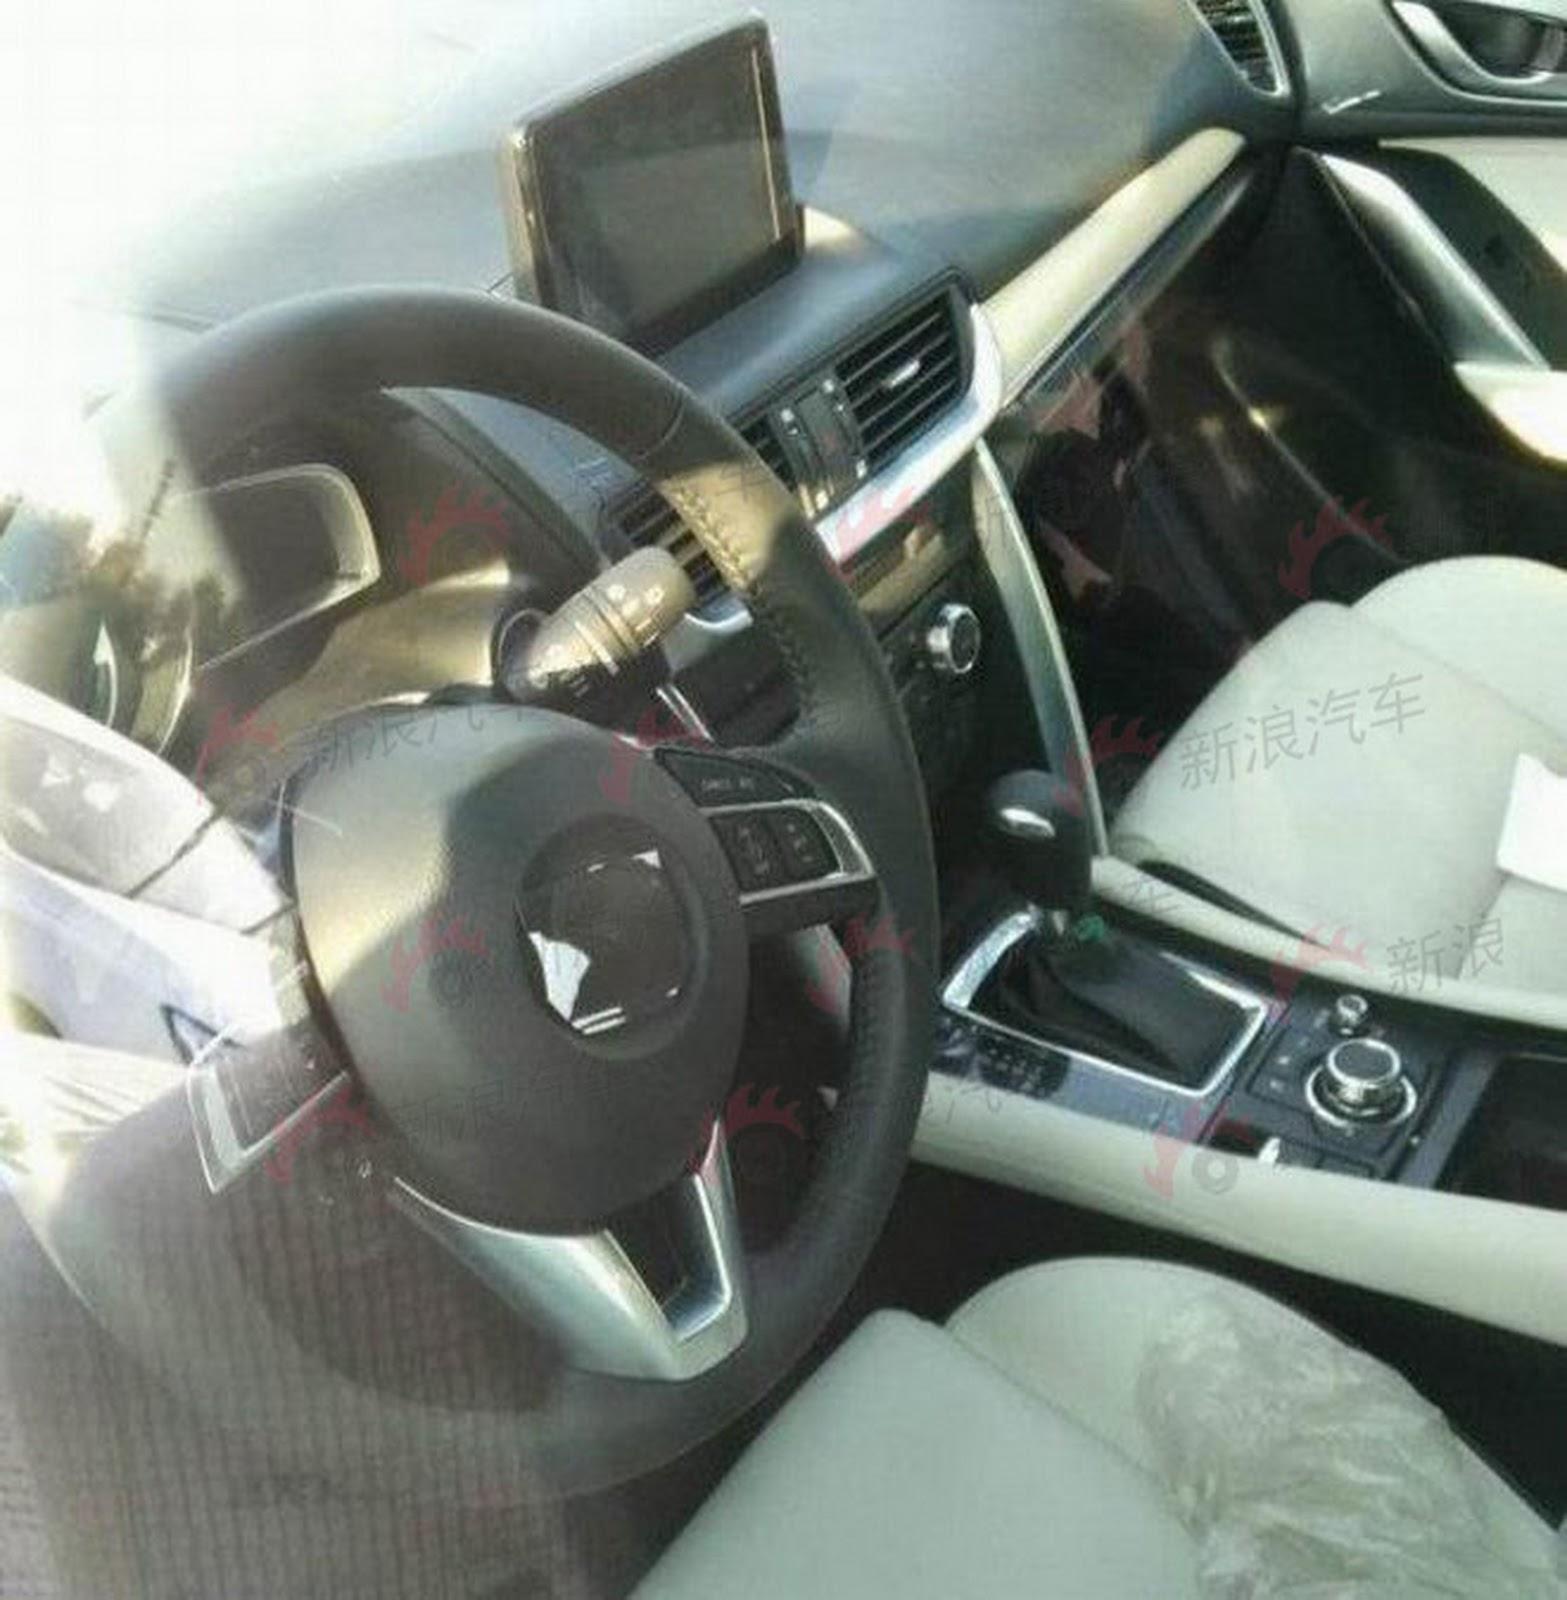 http://4.bp.blogspot.com/--byTWwZacQI/VgQRUXGqUII/AAAAAAABJ5I/cP5dHQppG5I/s1600/2017-Mazda-CX-7-9.jpg